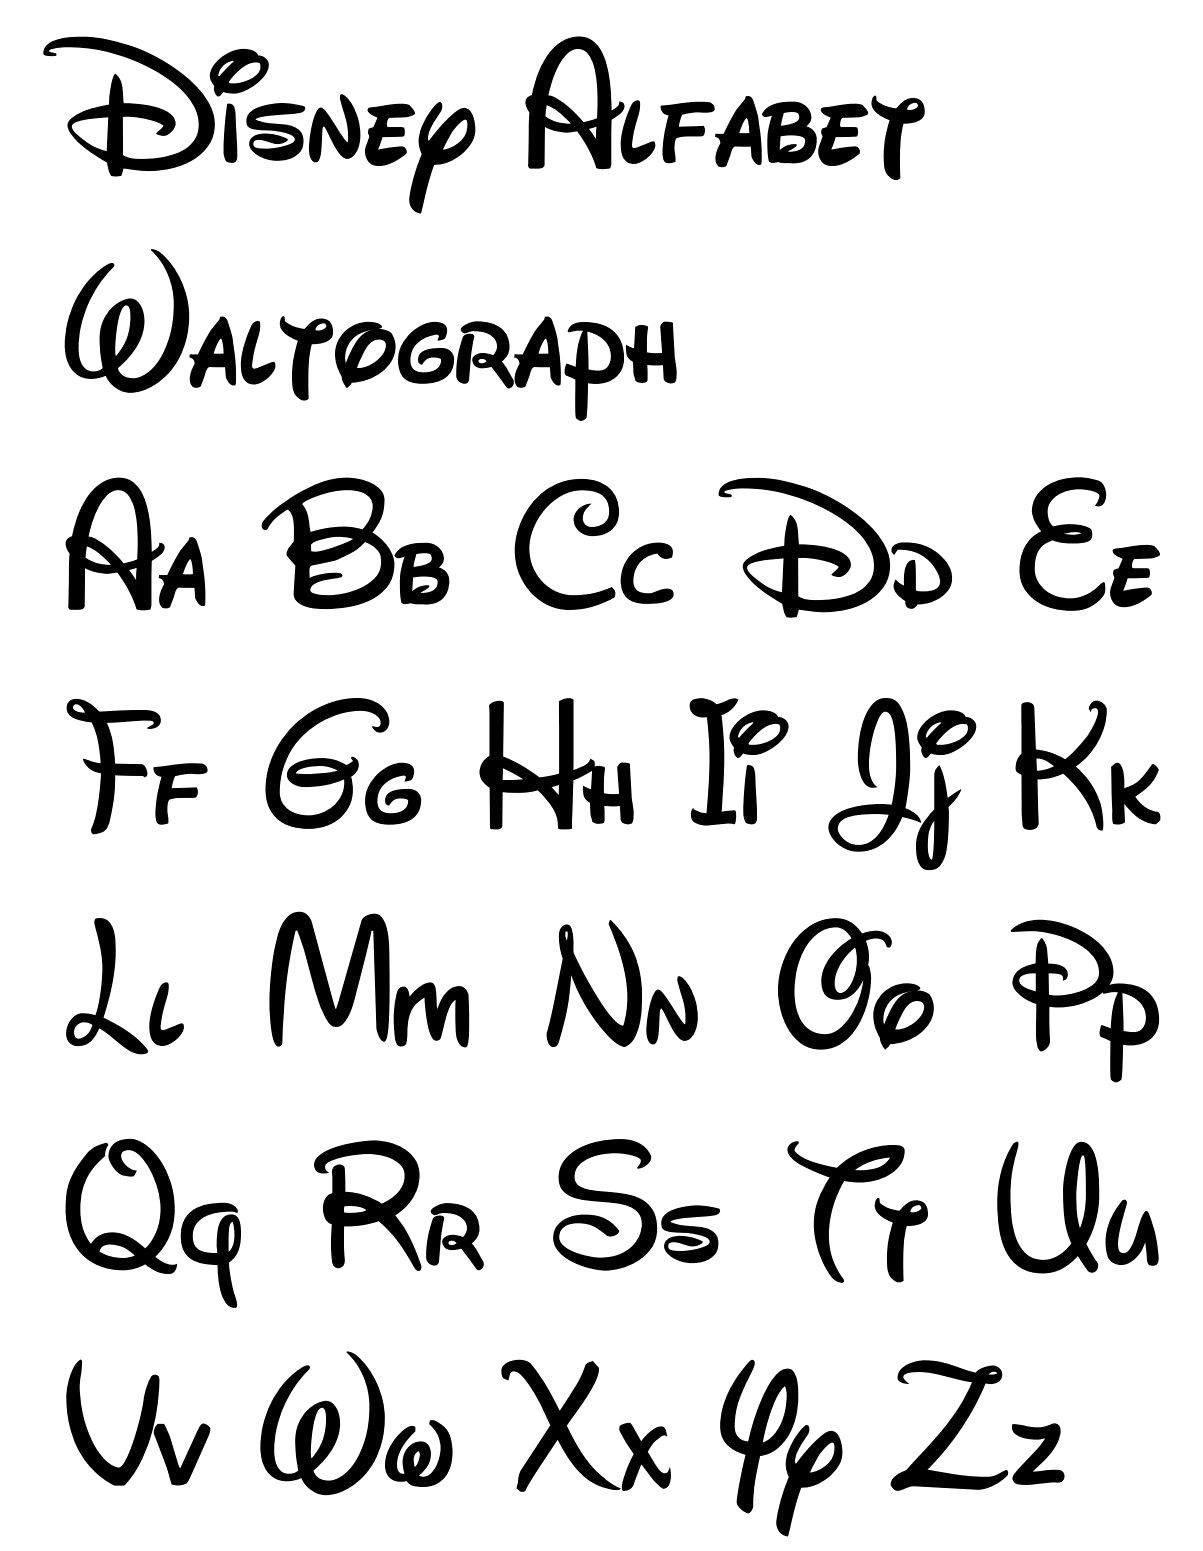 Free Printable Disney Letter Stencils | Calligraphy In 2019 | Disney - Free Printable Calligraphy Letter Stencils